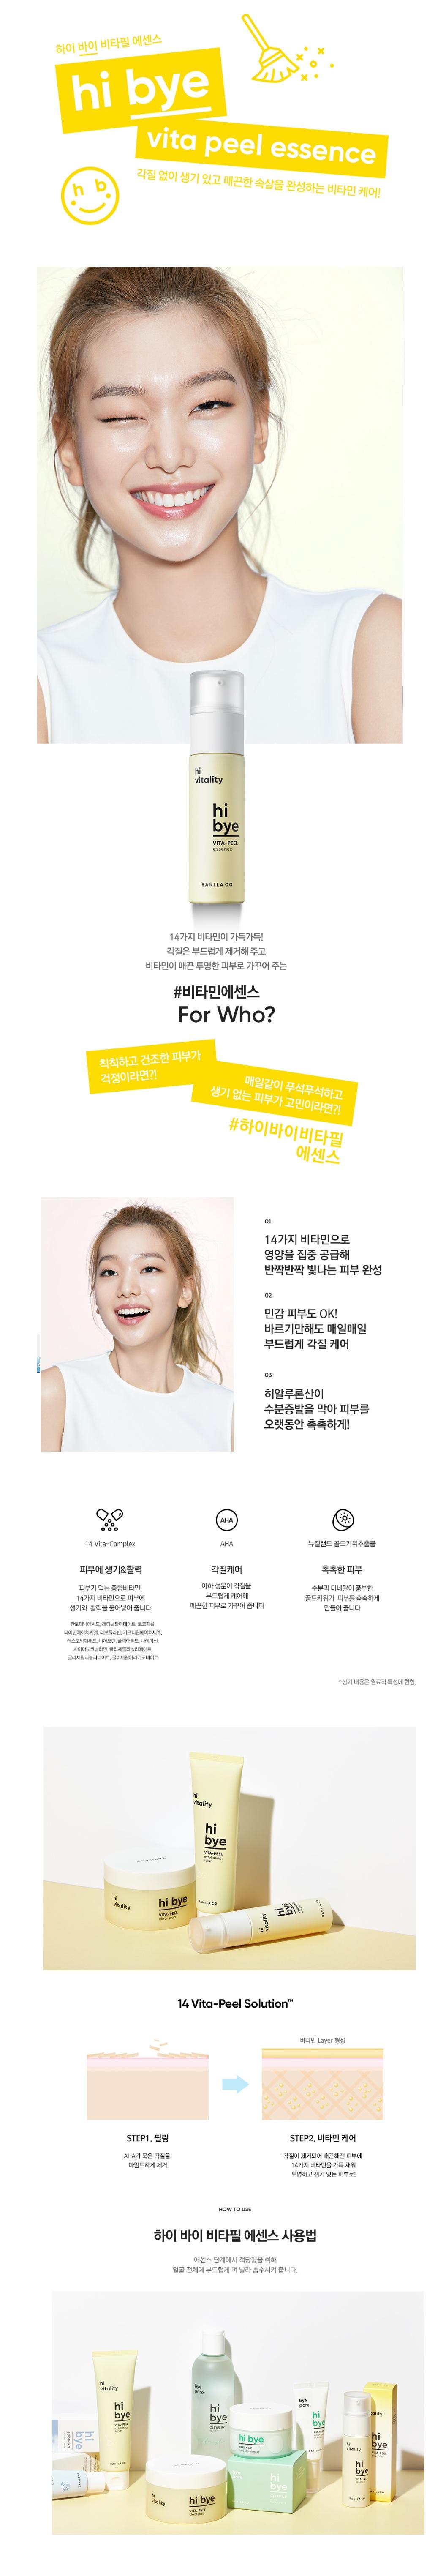 Banila Co Hi Bye Vital Peel Essence korean cosmetic skincare product online shop malaysia macau singapore1